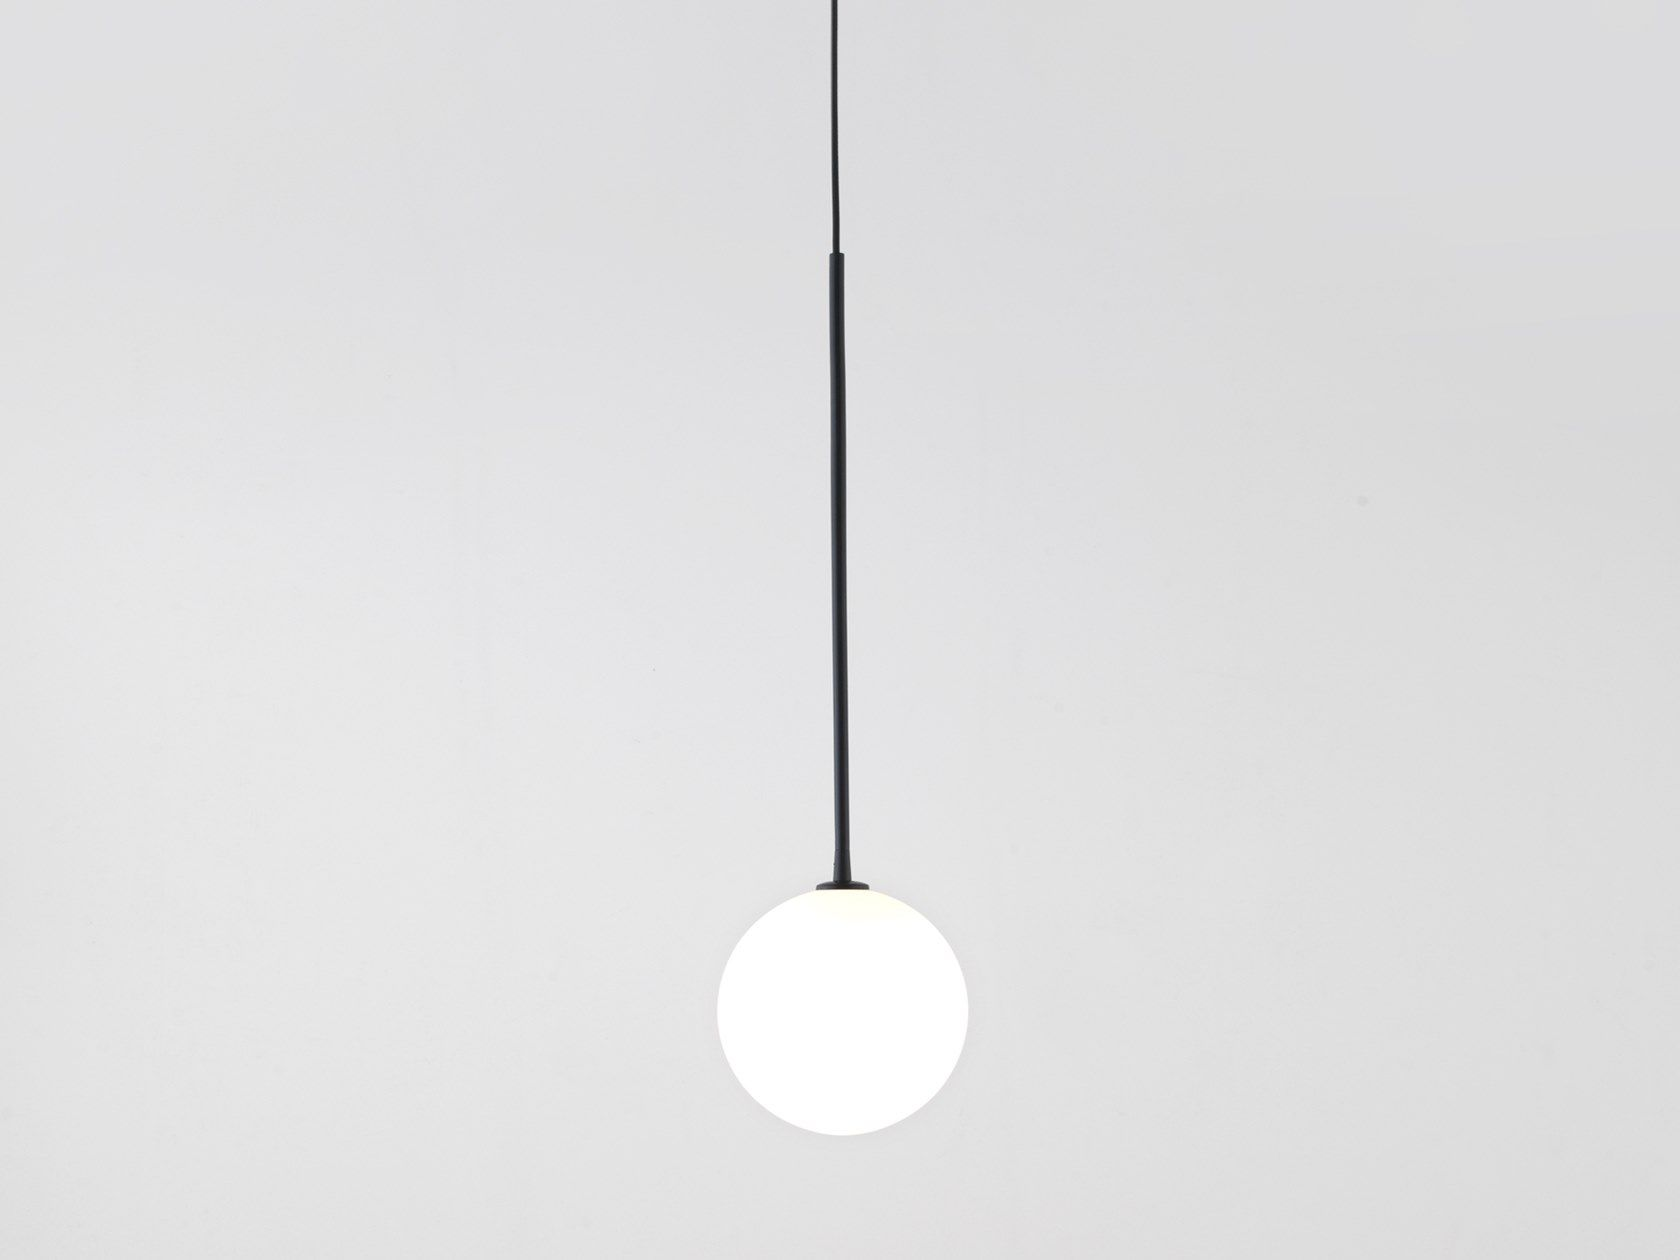 Opal Glass Pendant Lamp Ball Pendant Lamp By Aromas Del Campo Pendant Lamp Lamp Glass Pendant Lamp